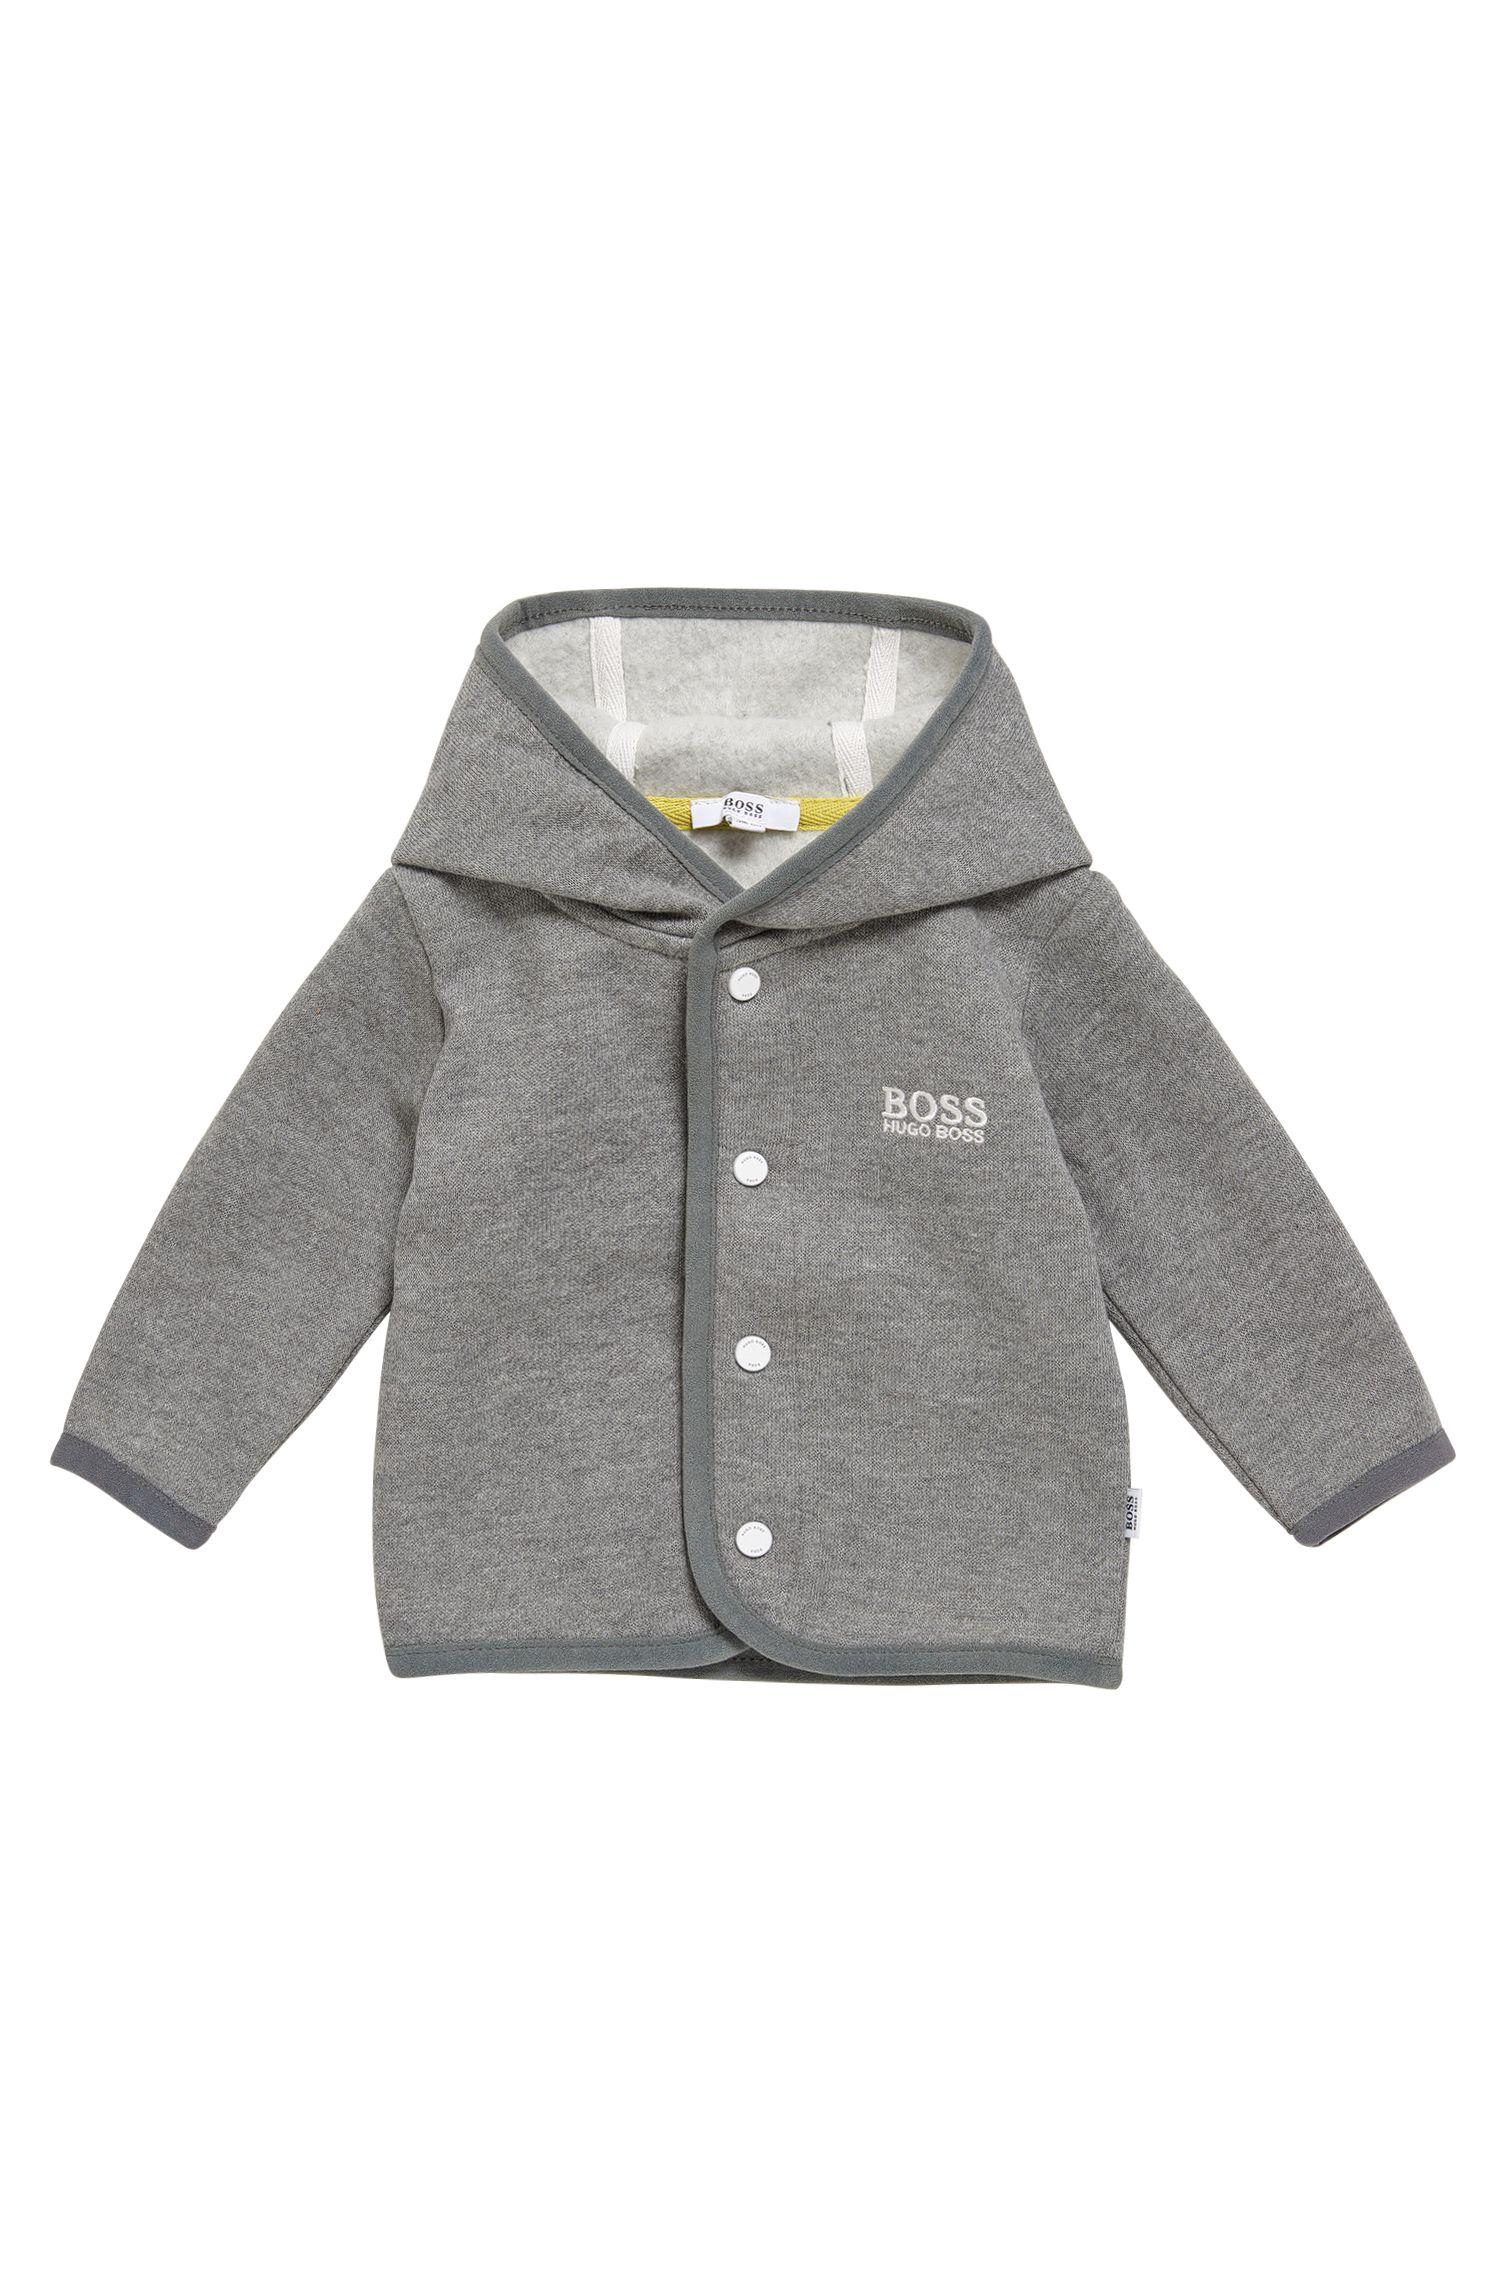 'J95212' | Stretch Cotton Hooded Sweatshirt Jacket